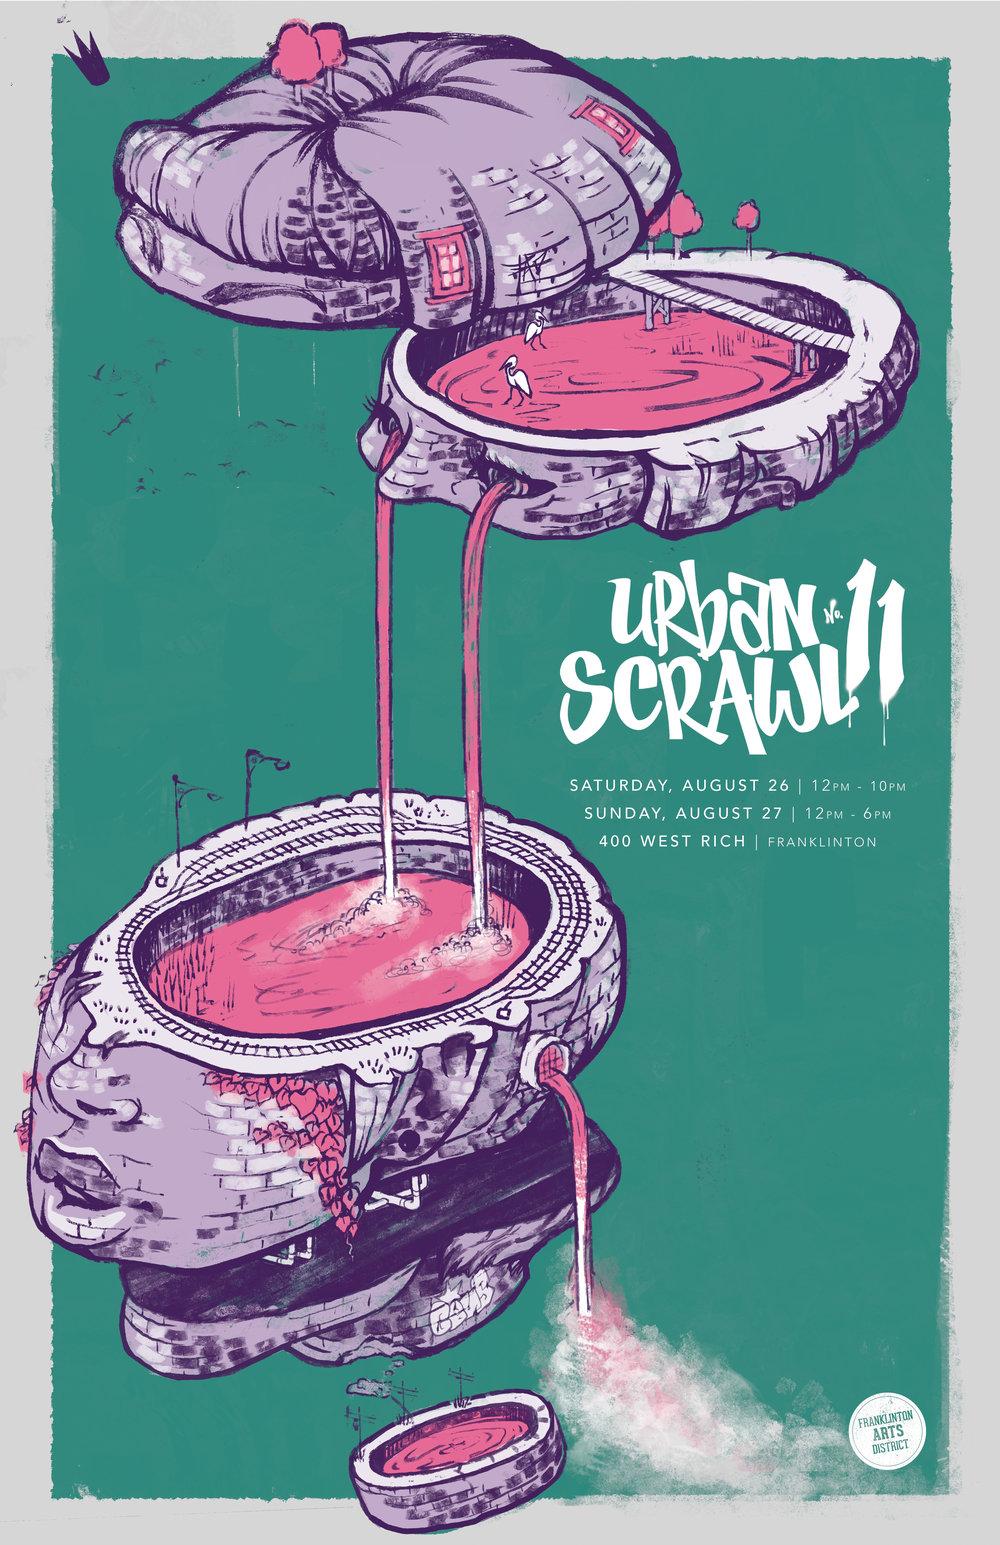 Urban Scrawl 11 Poster